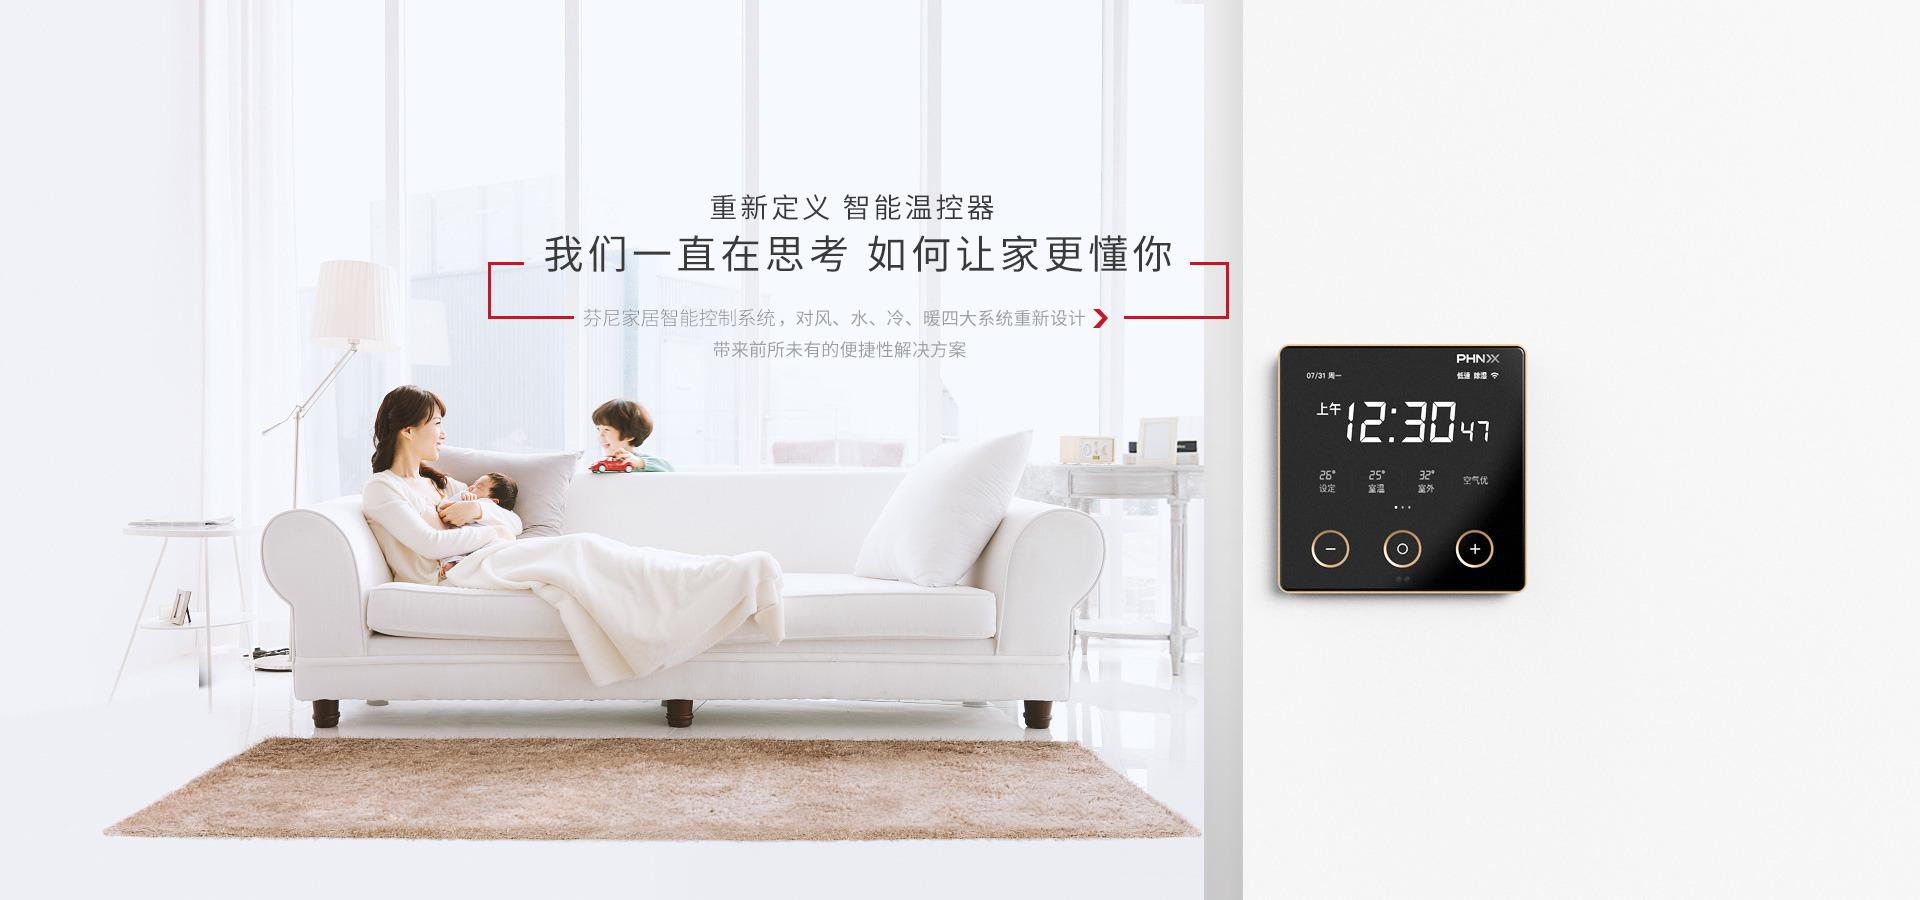 ysb288易胜博官网空气能热水器_智能温控解决方案